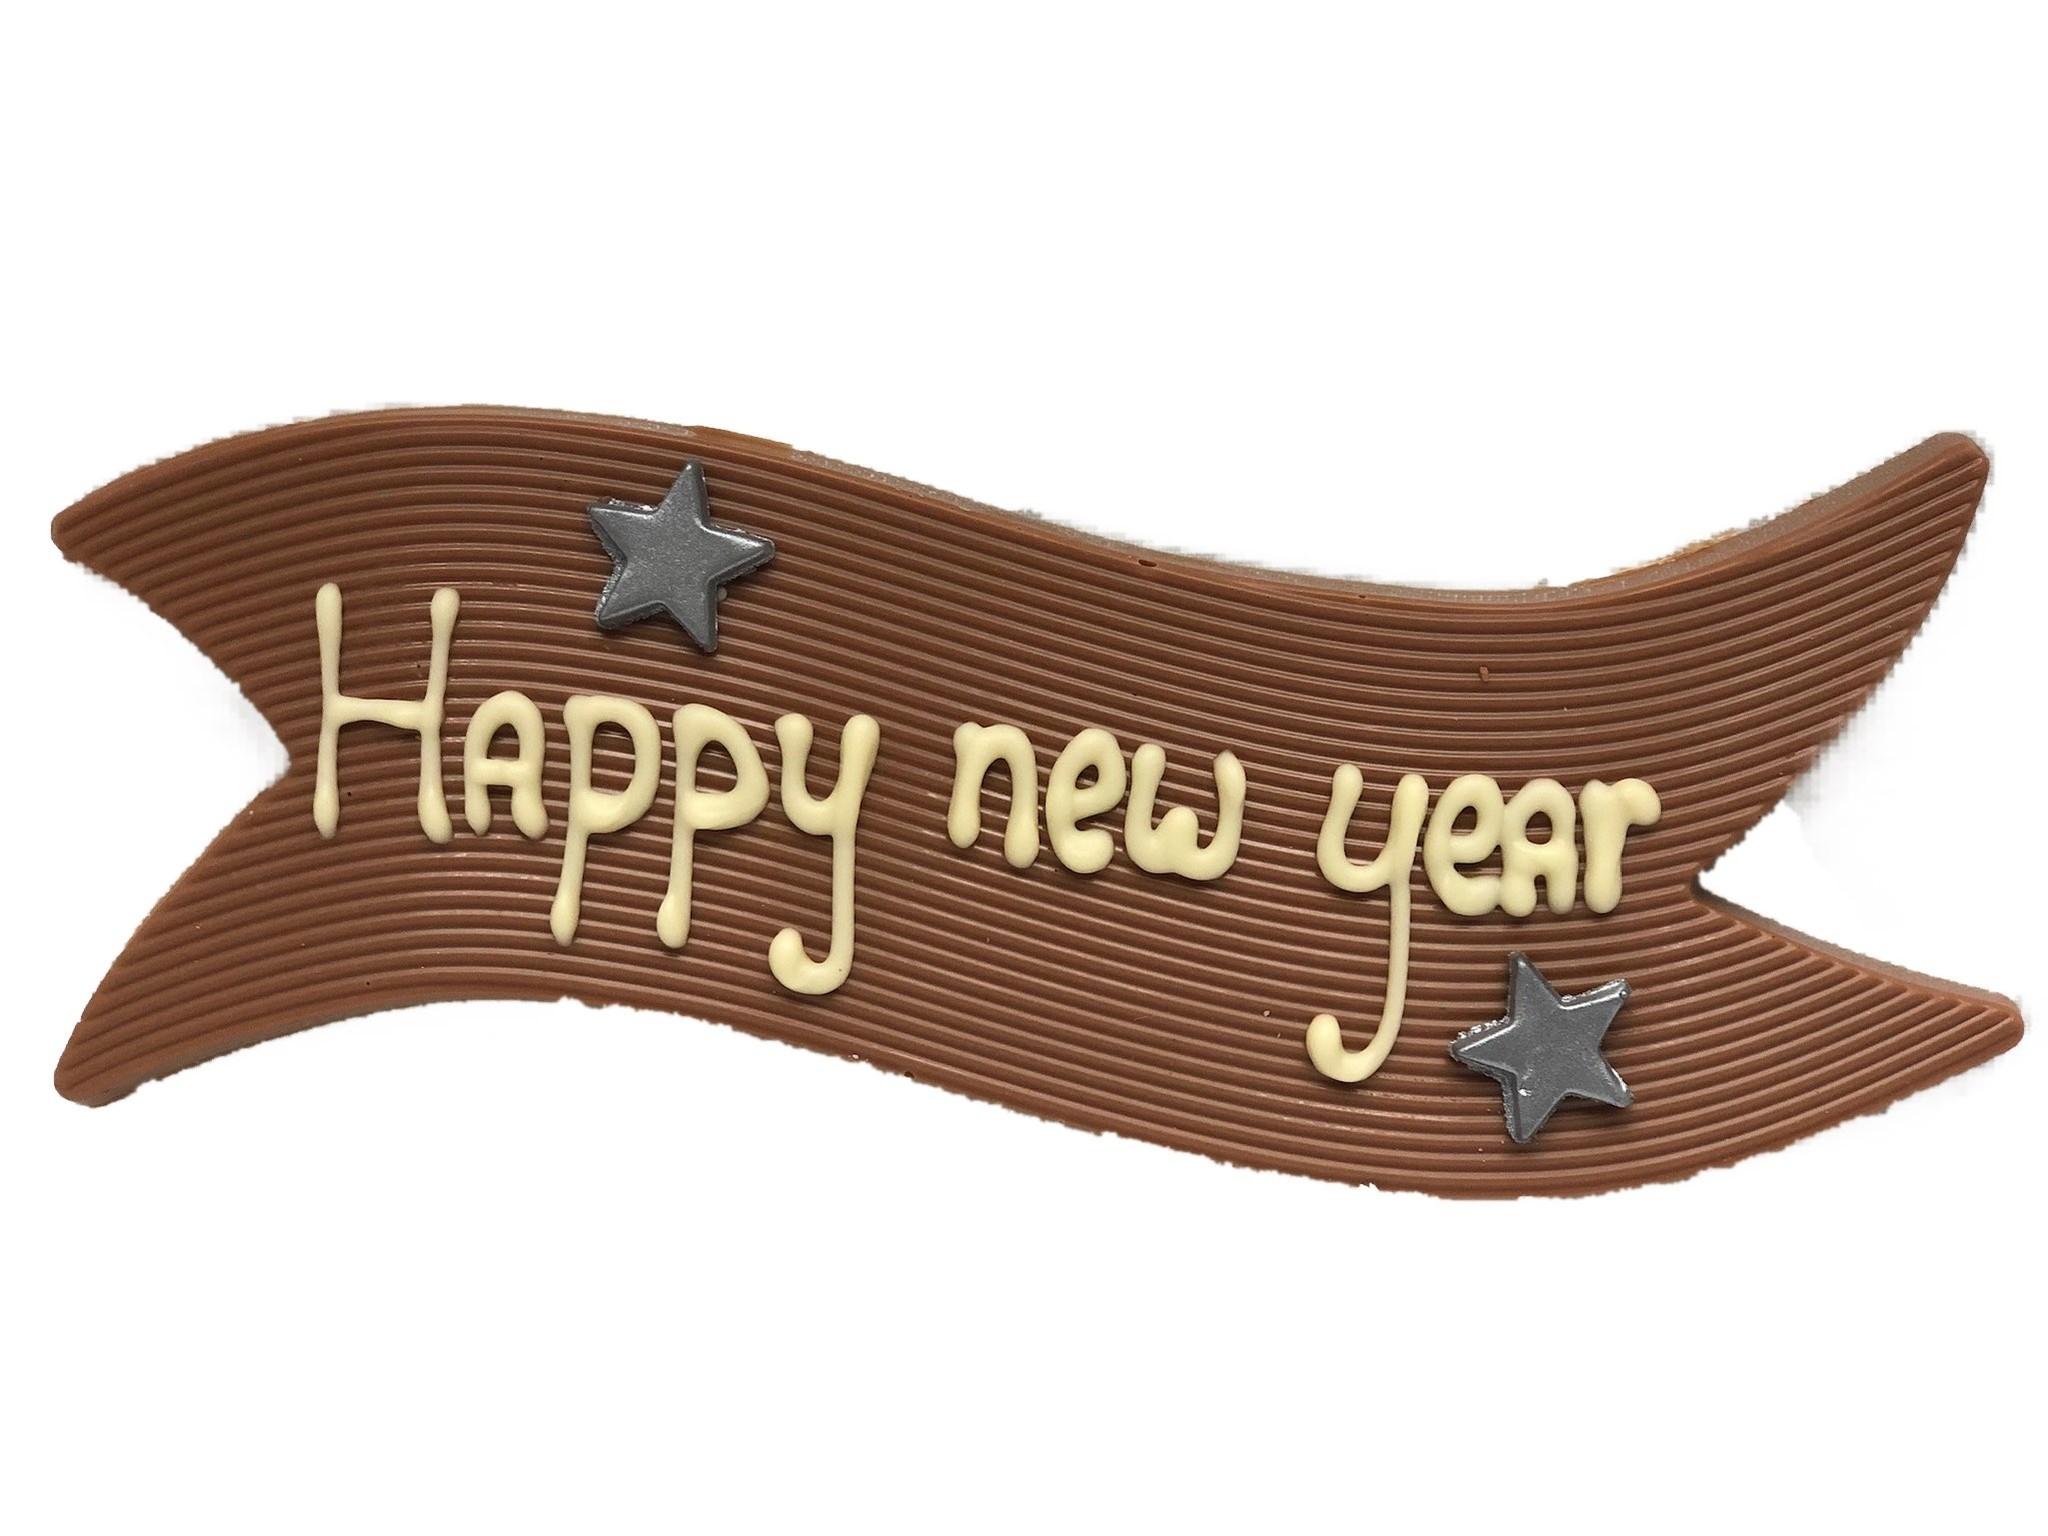 Nieuwjaarswens op chocolade vaandel